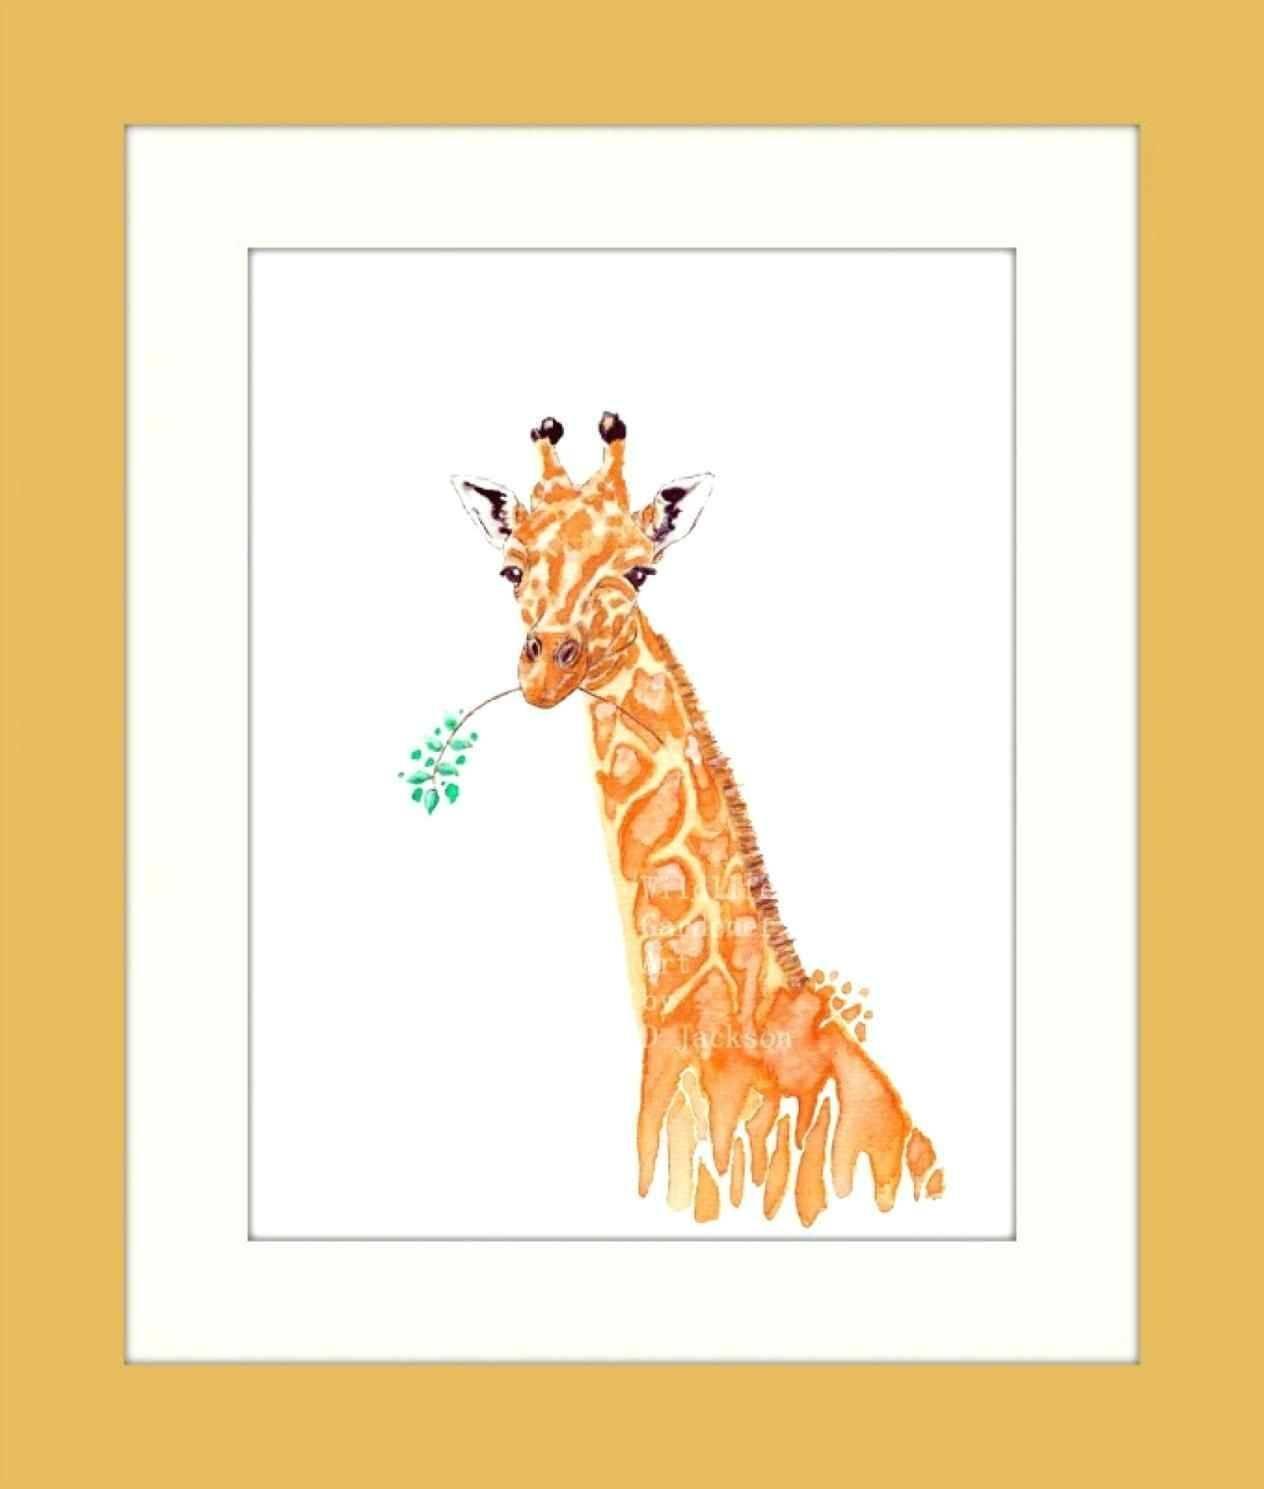 Art Wall Art Giraffe Hoagard Resin Head Resin Giraffe Metal Wall For Newest Giraffe Metal Wall Art (View 4 of 20)